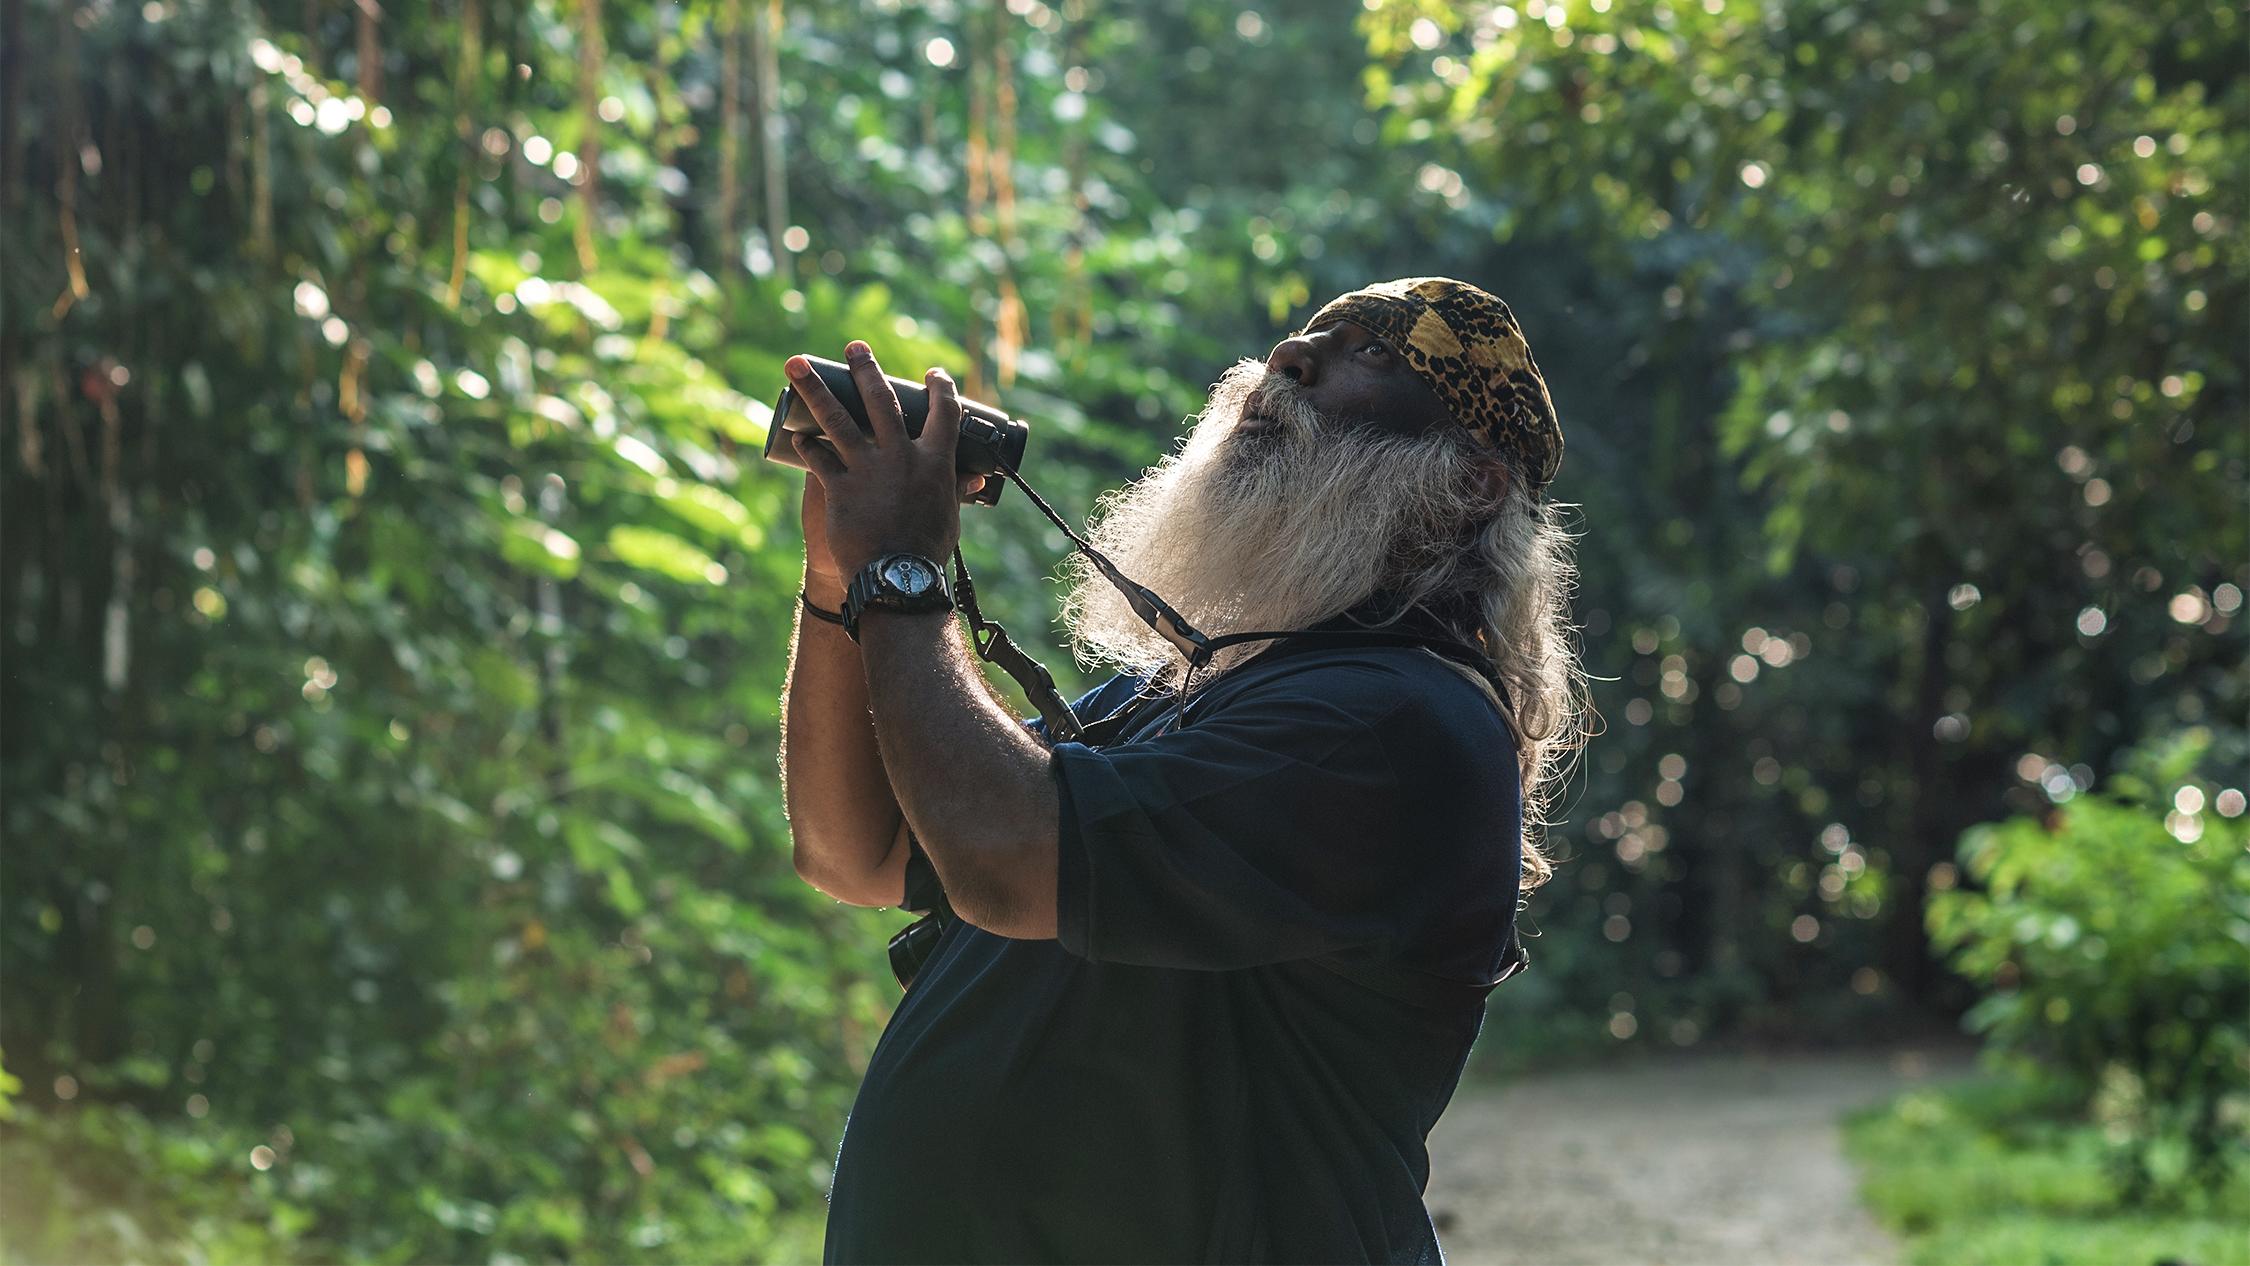 Subaraj Rajathurai